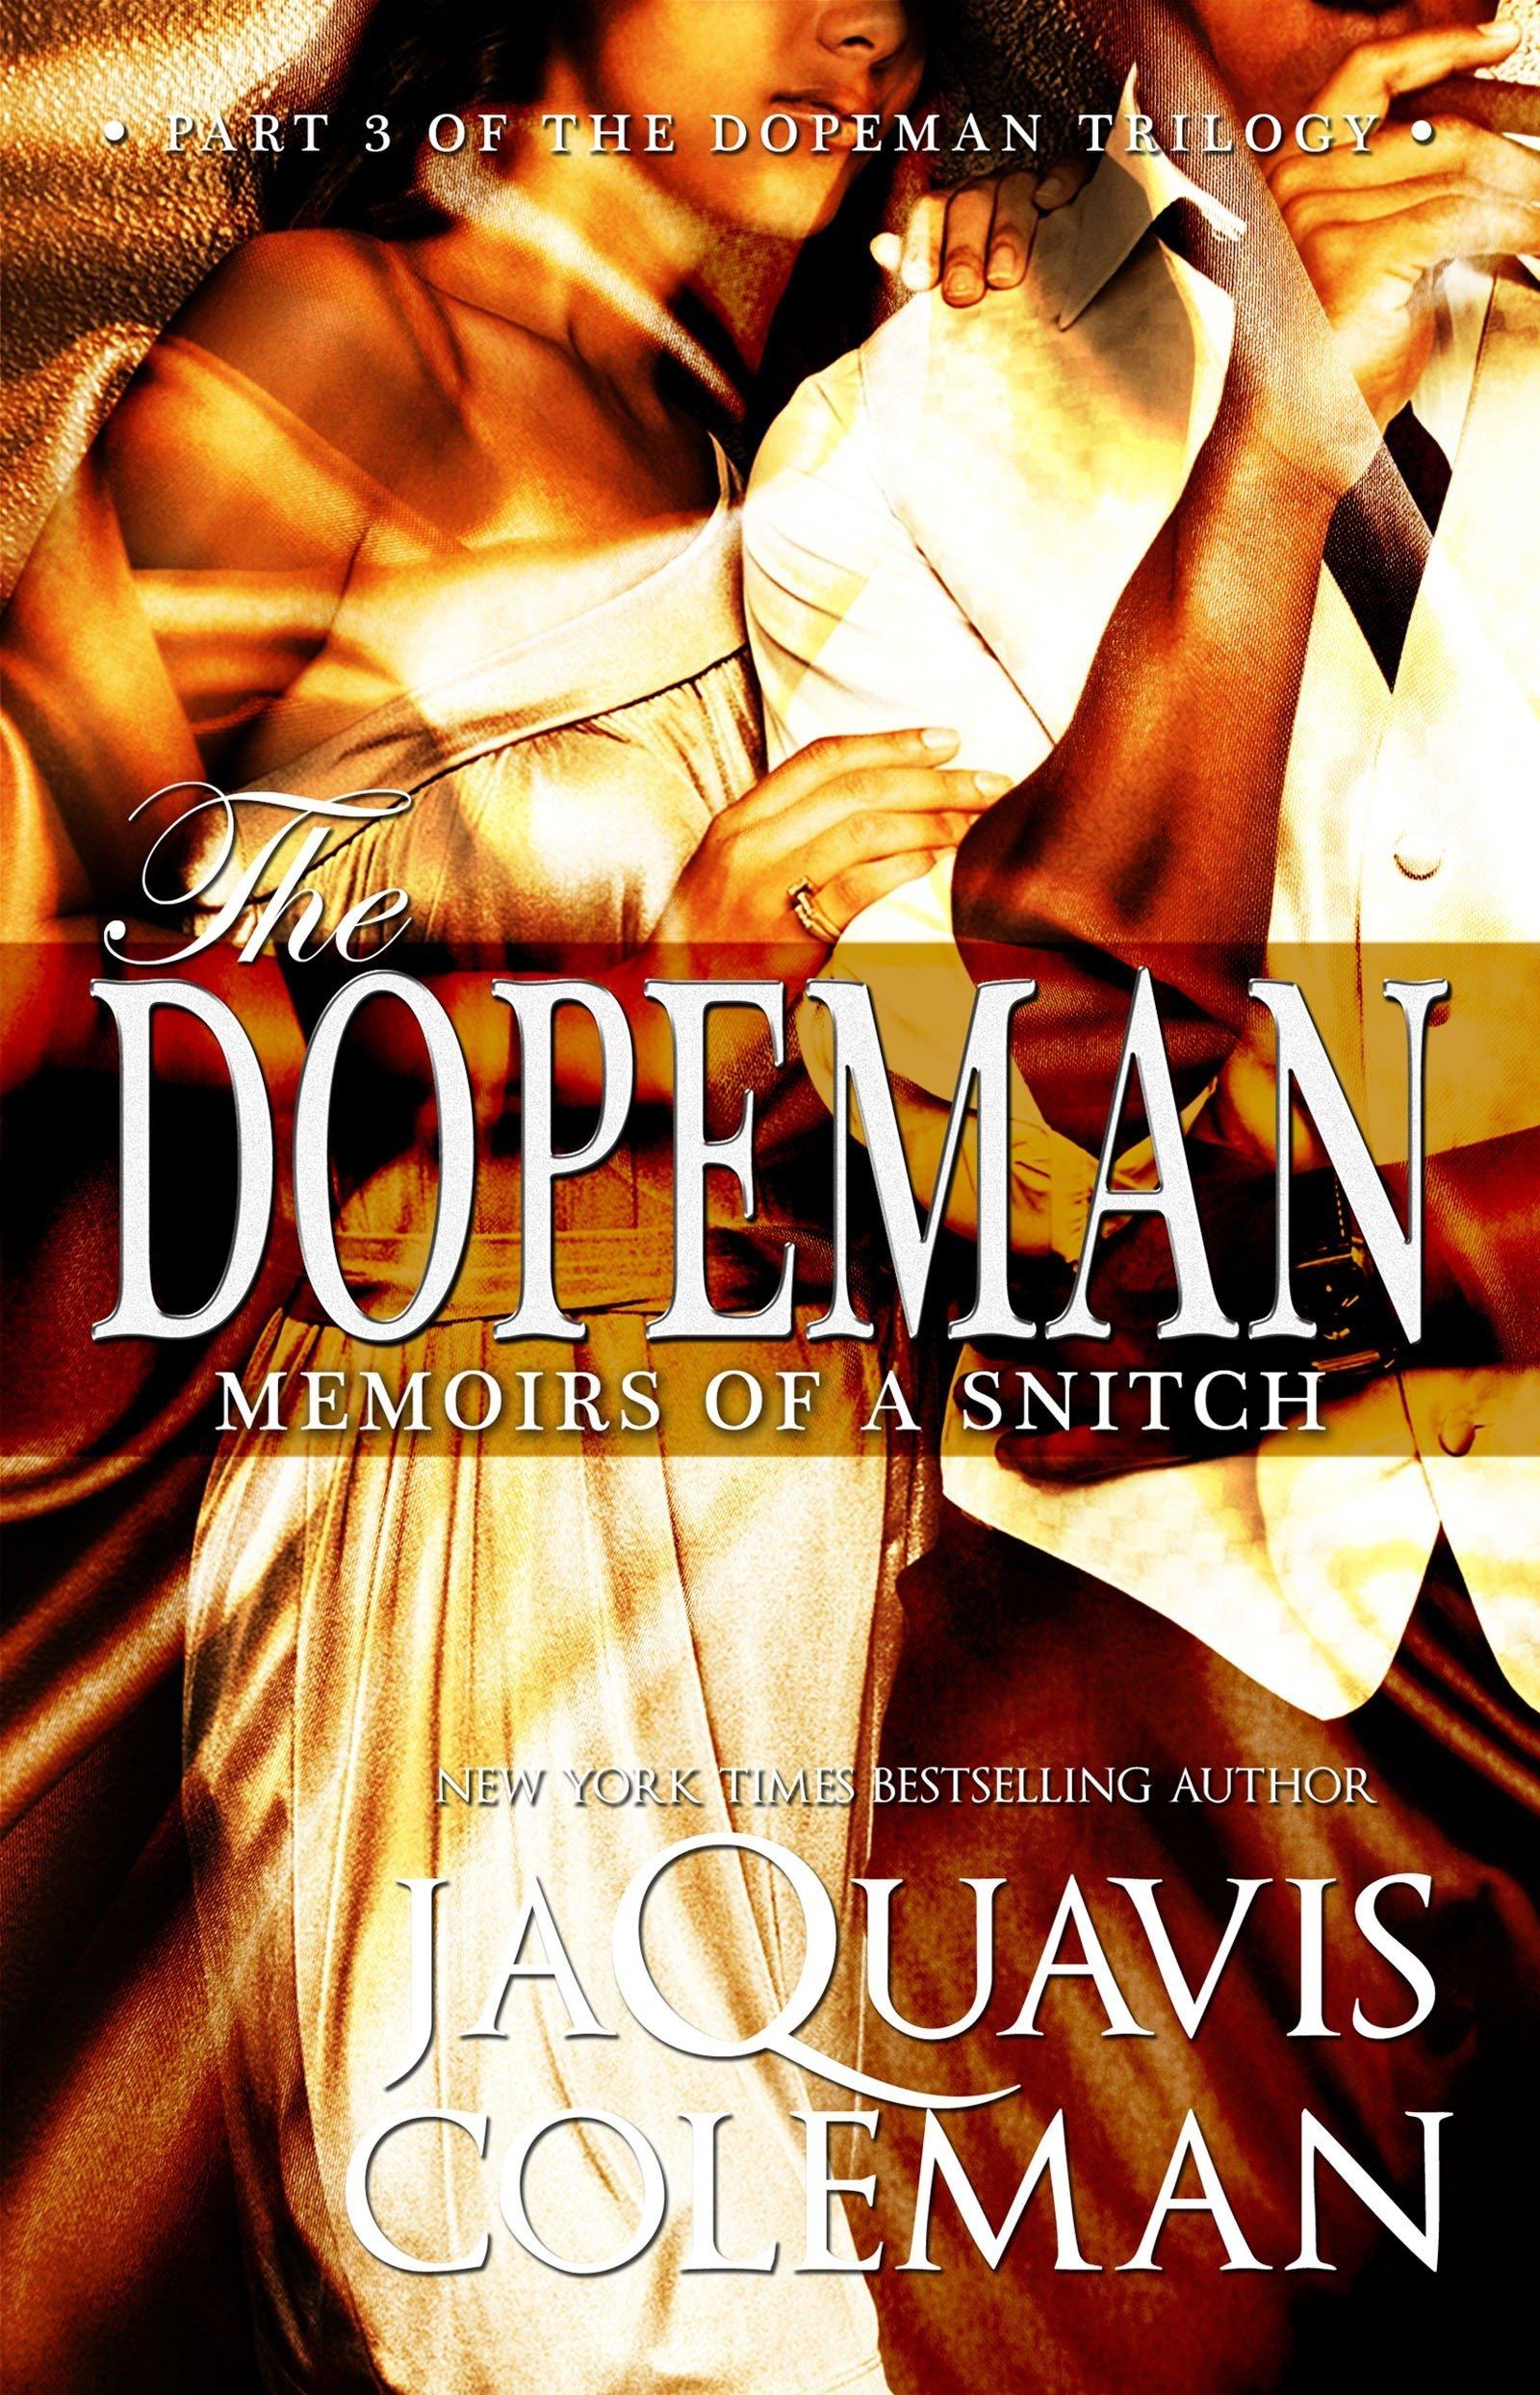 Read Online Dopeman: Memoirs of a Snitch:: Part 3 of Dopeman's Trilogy (The Dopeman) ebook